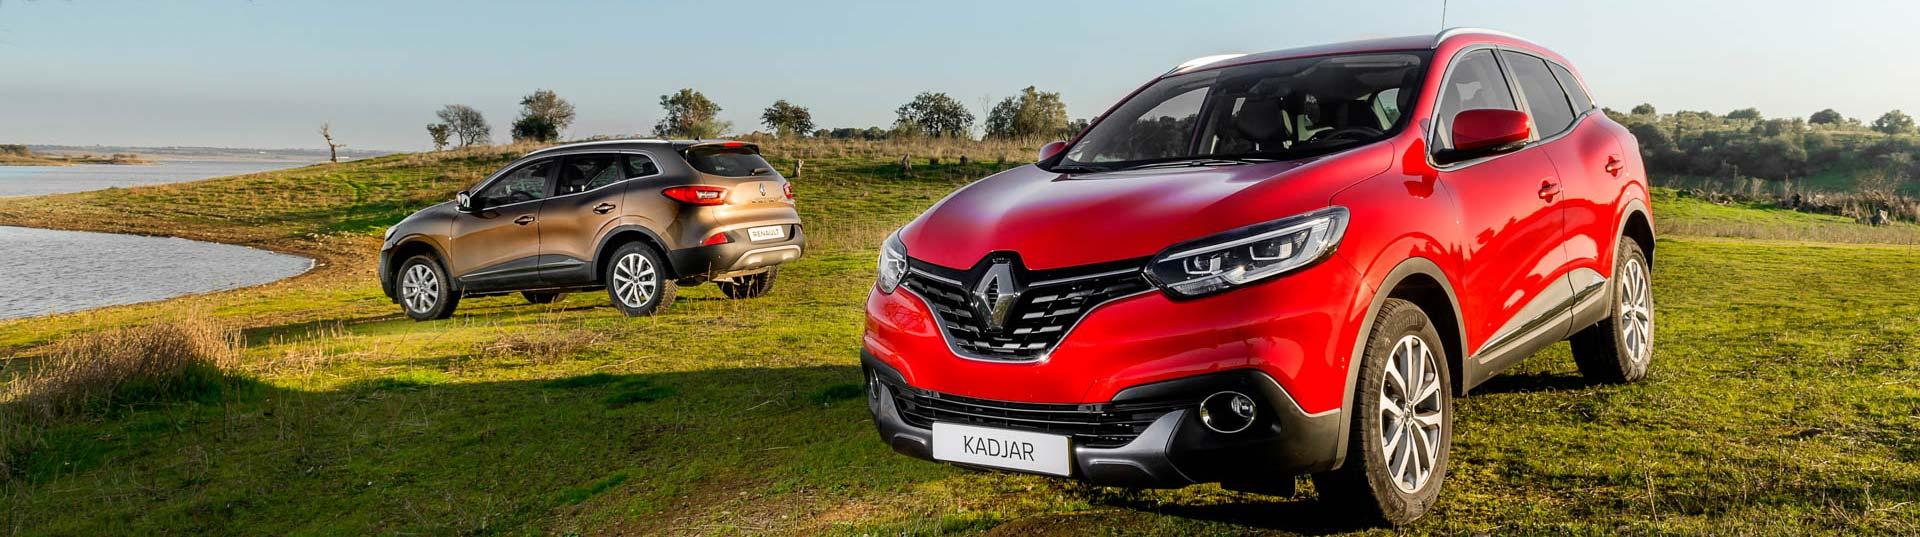 Novo Renault Kadjar